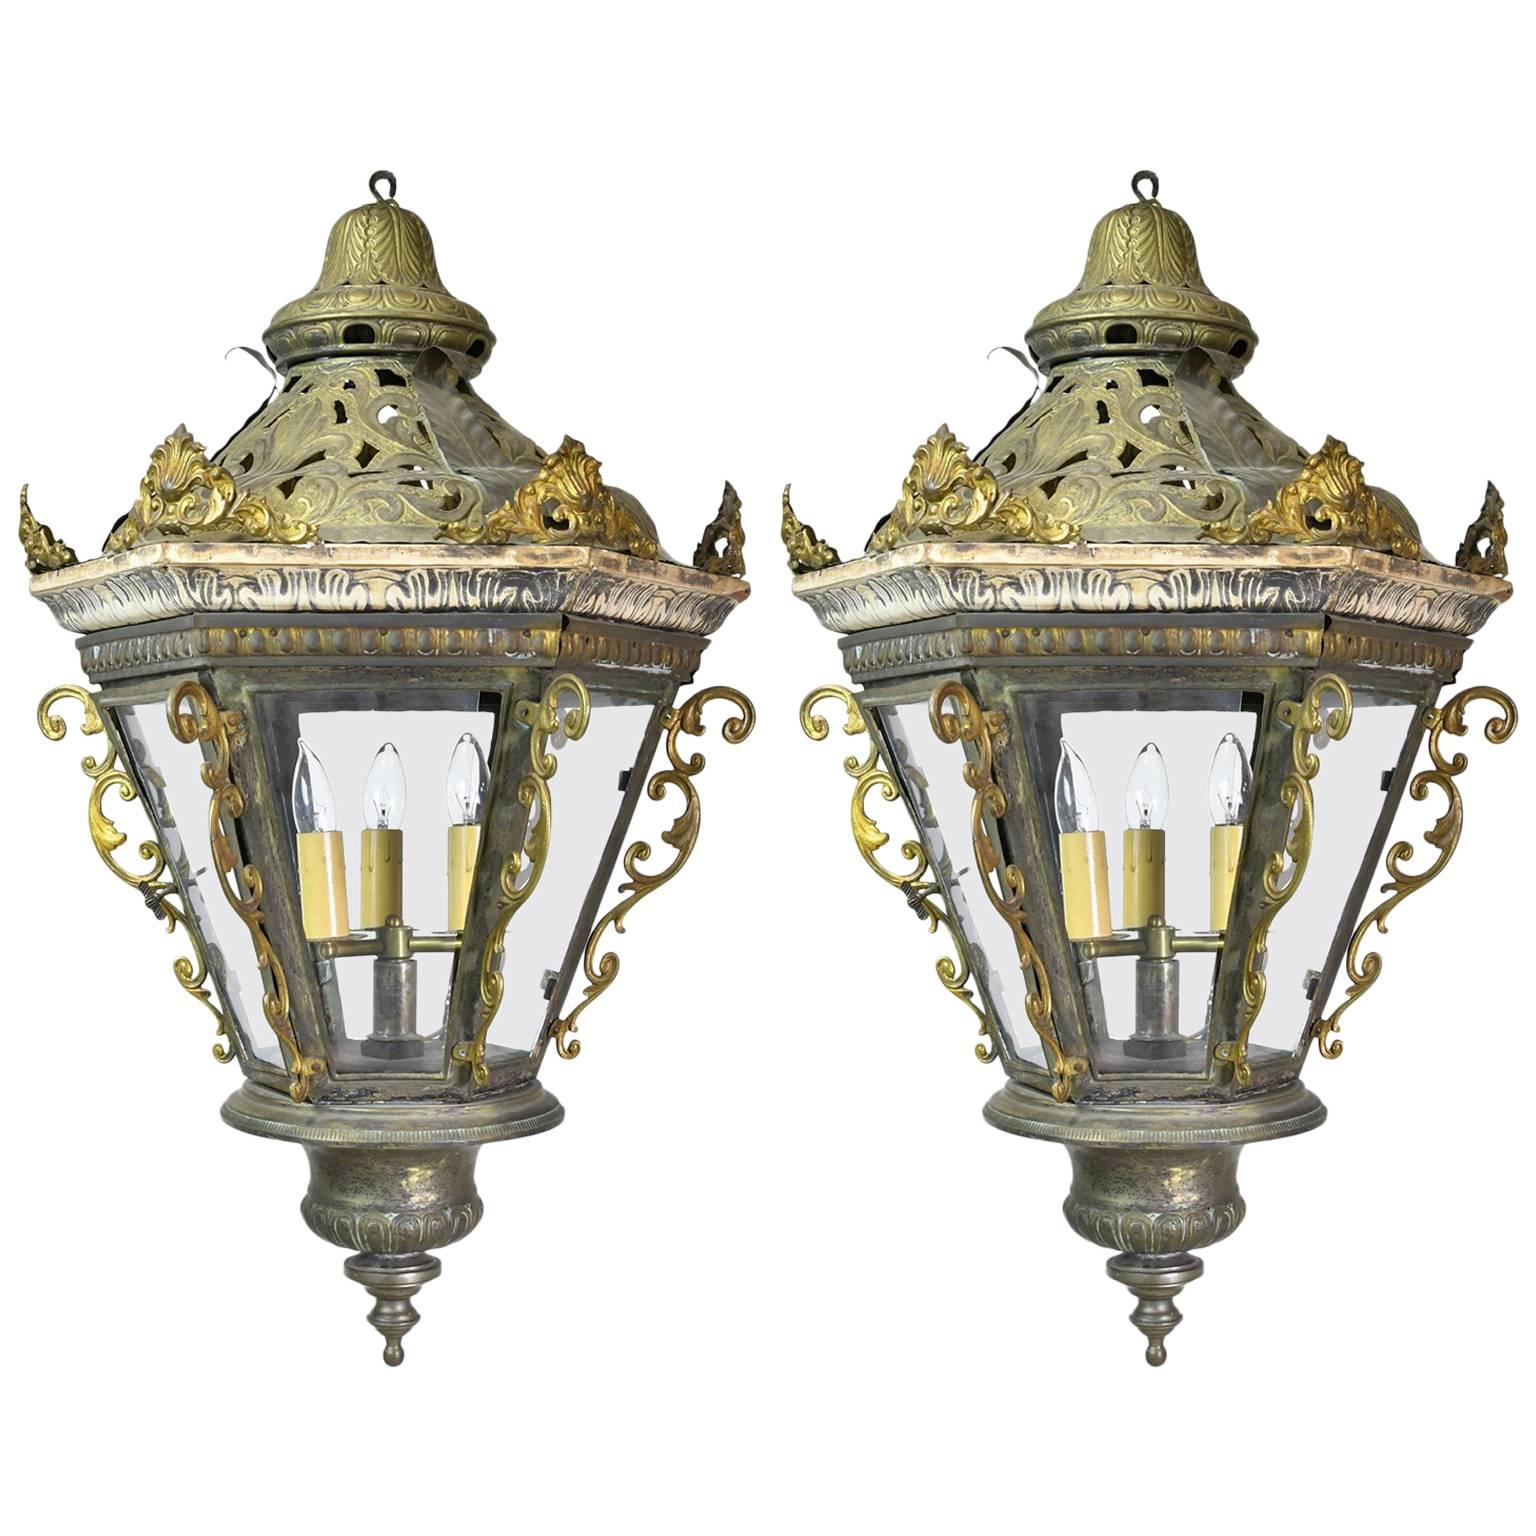 Pair of Late 19th Century Baroque-Style Venetian Gondola Lanterns